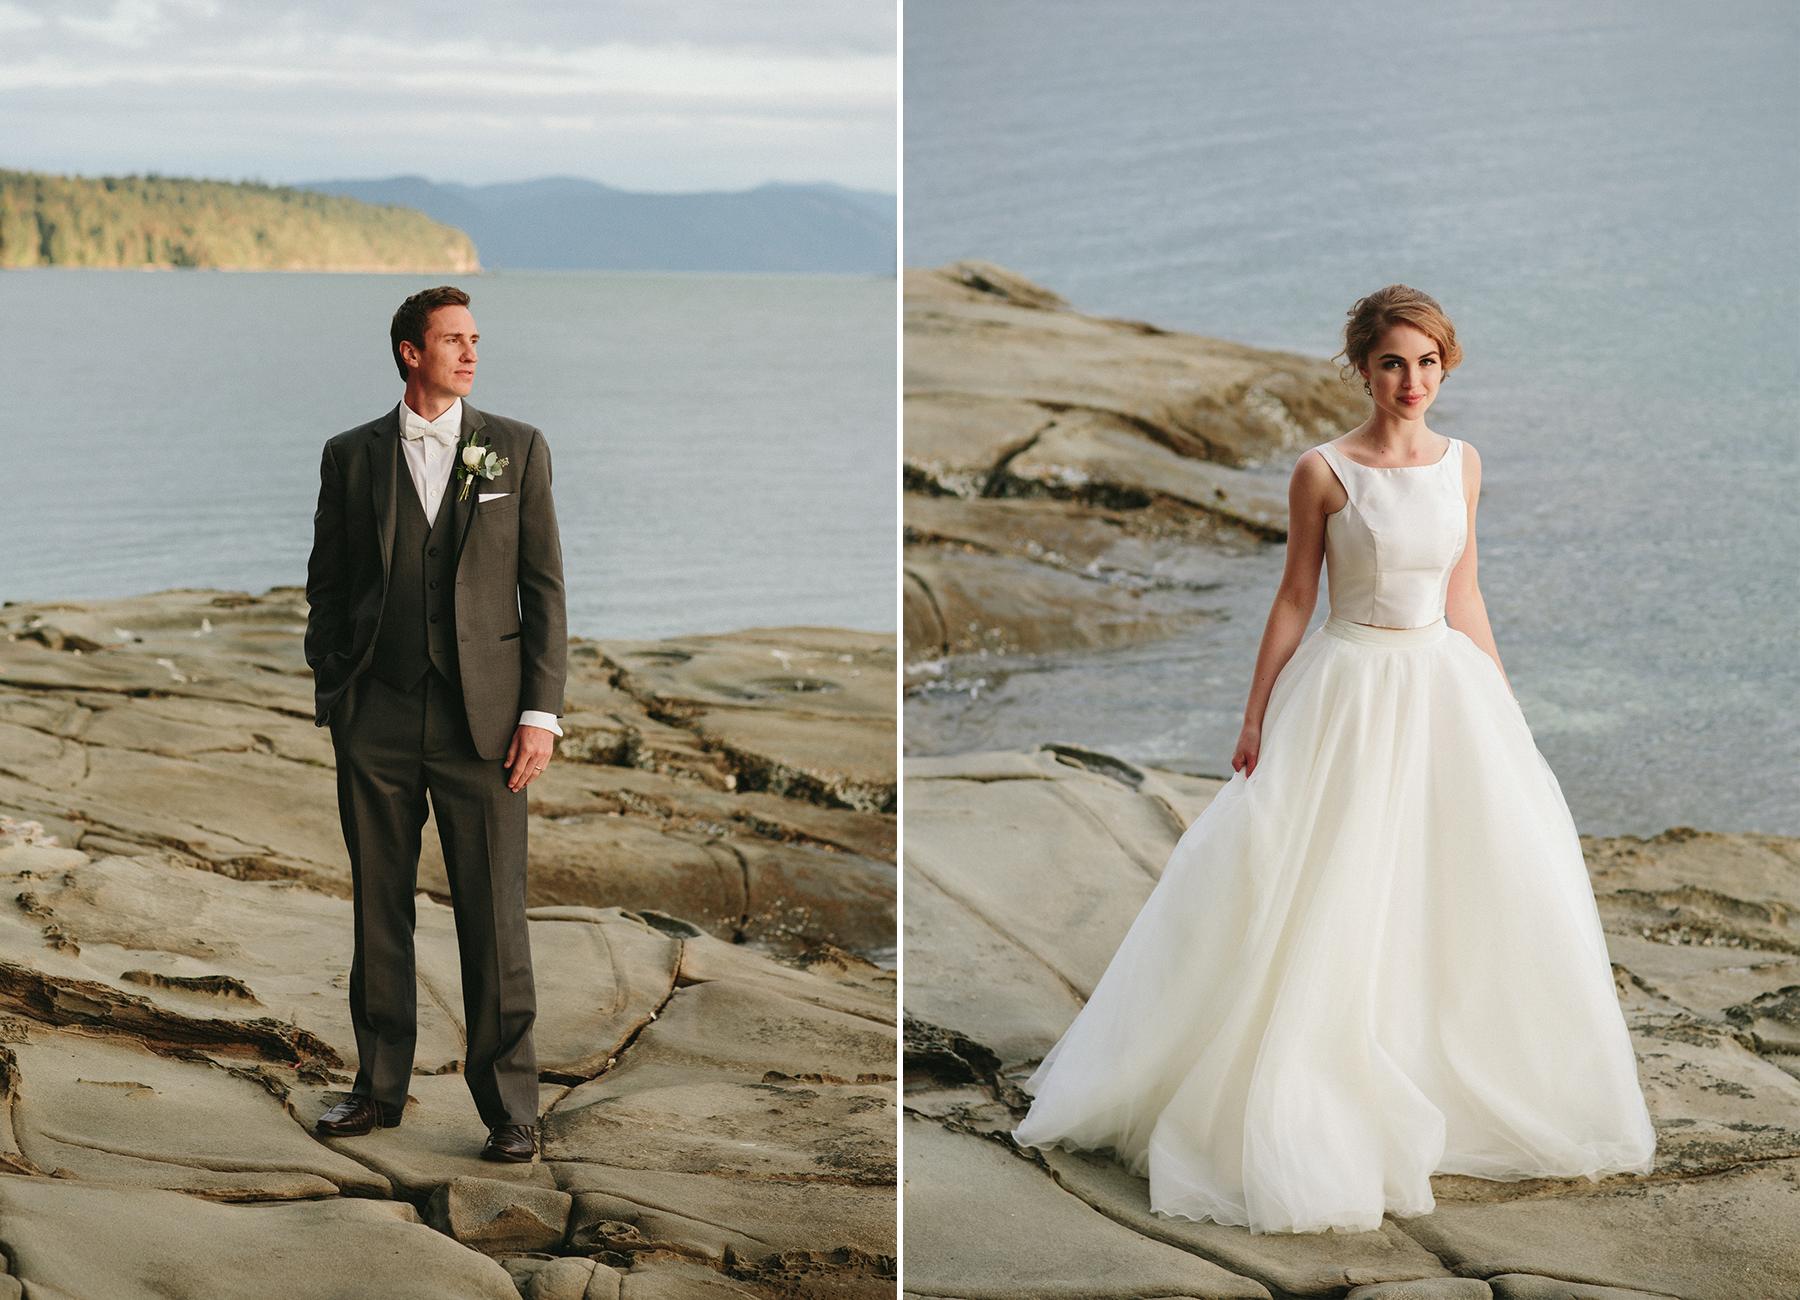 146-thetis-island-wedding-photographer-rp-rn2.jpg